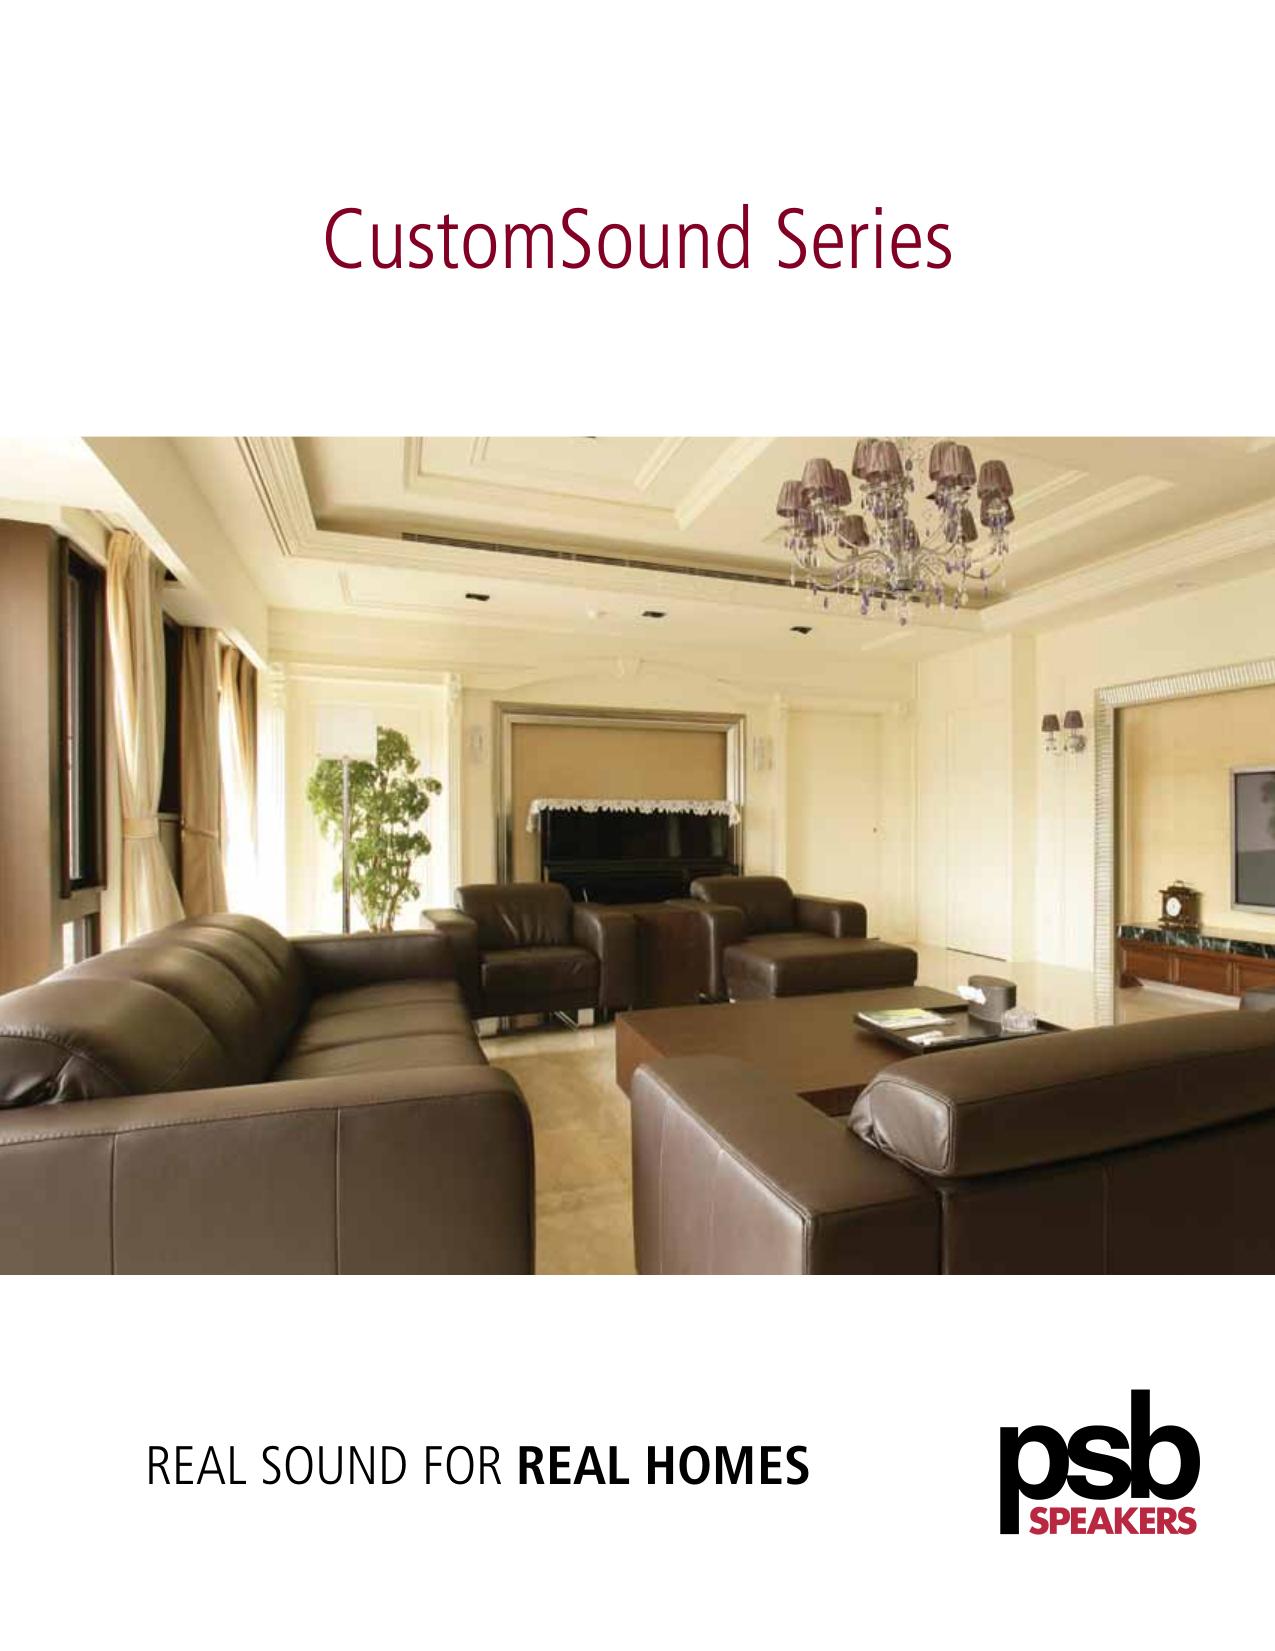 pdf for PSB Speaker System CustomSound CW800E manual